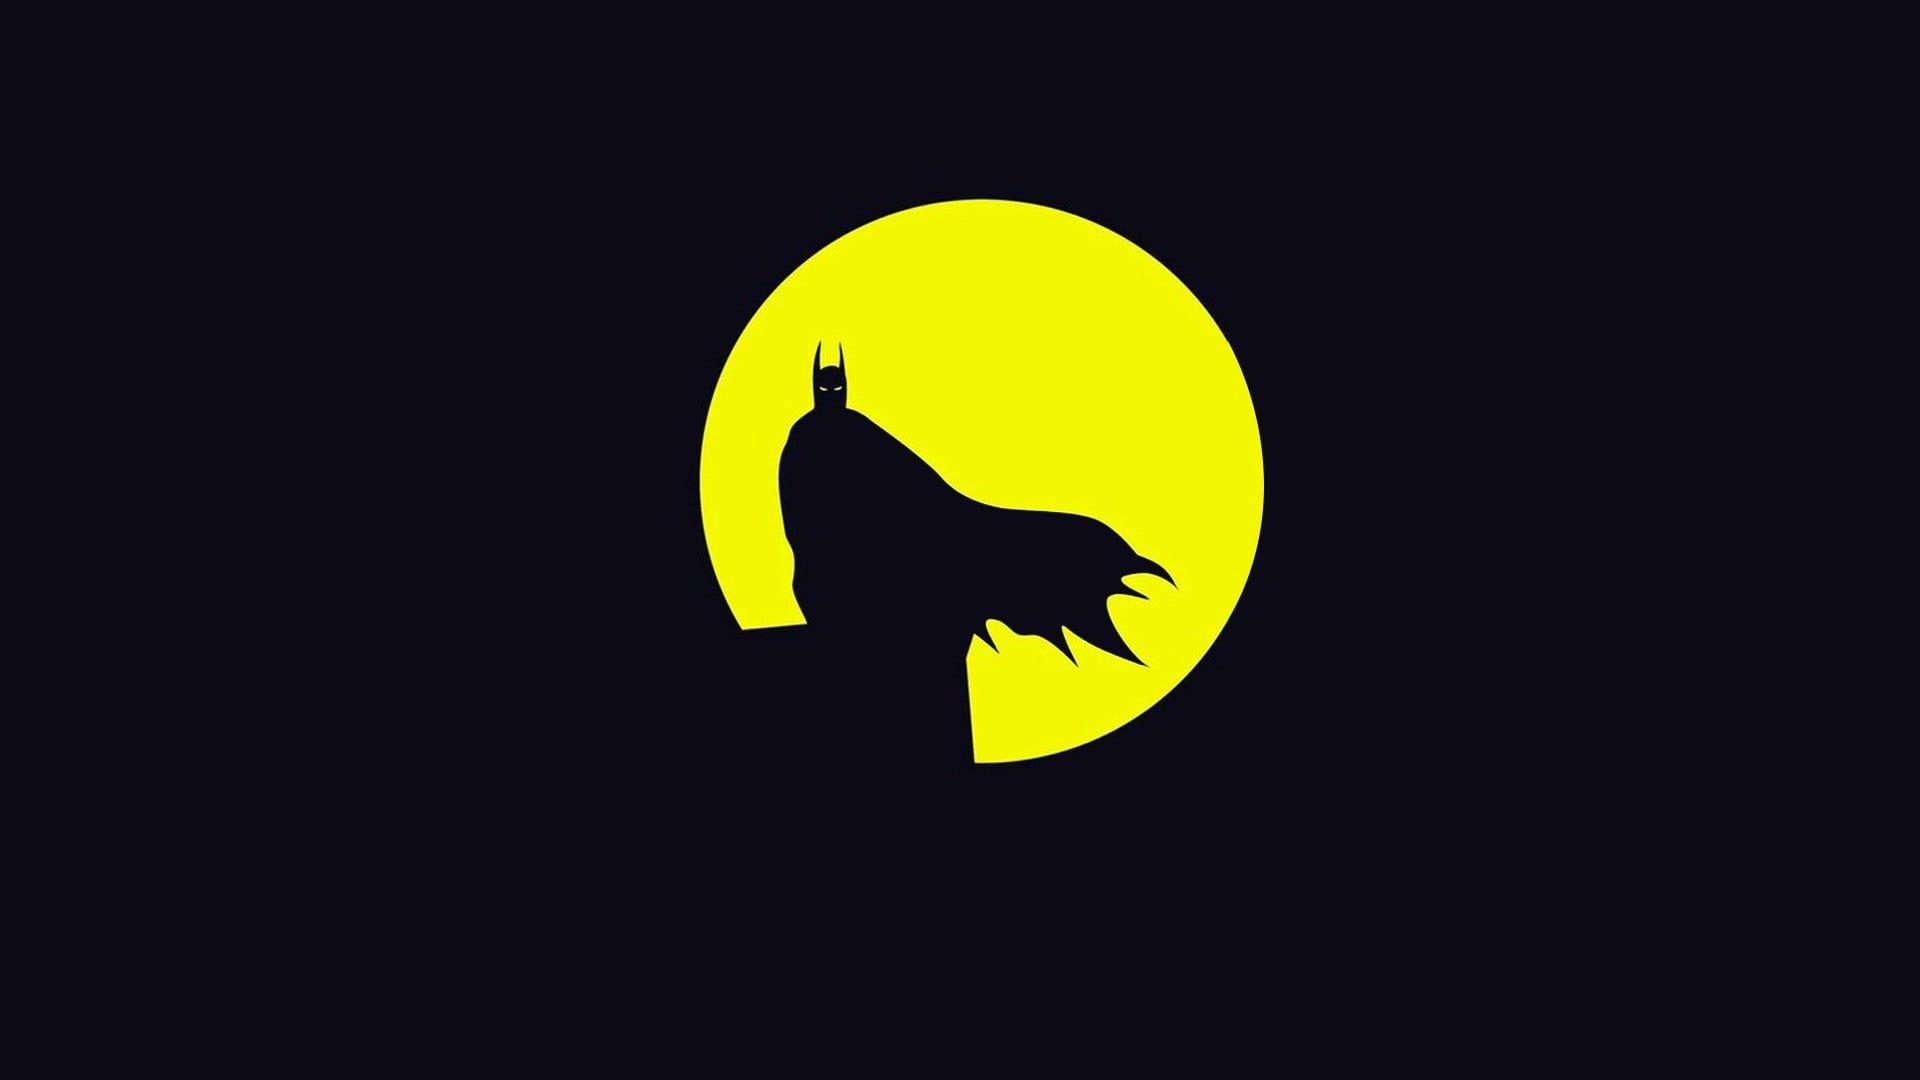 Batman Computer Black Yellow Wallpapers Wallpaper Cave